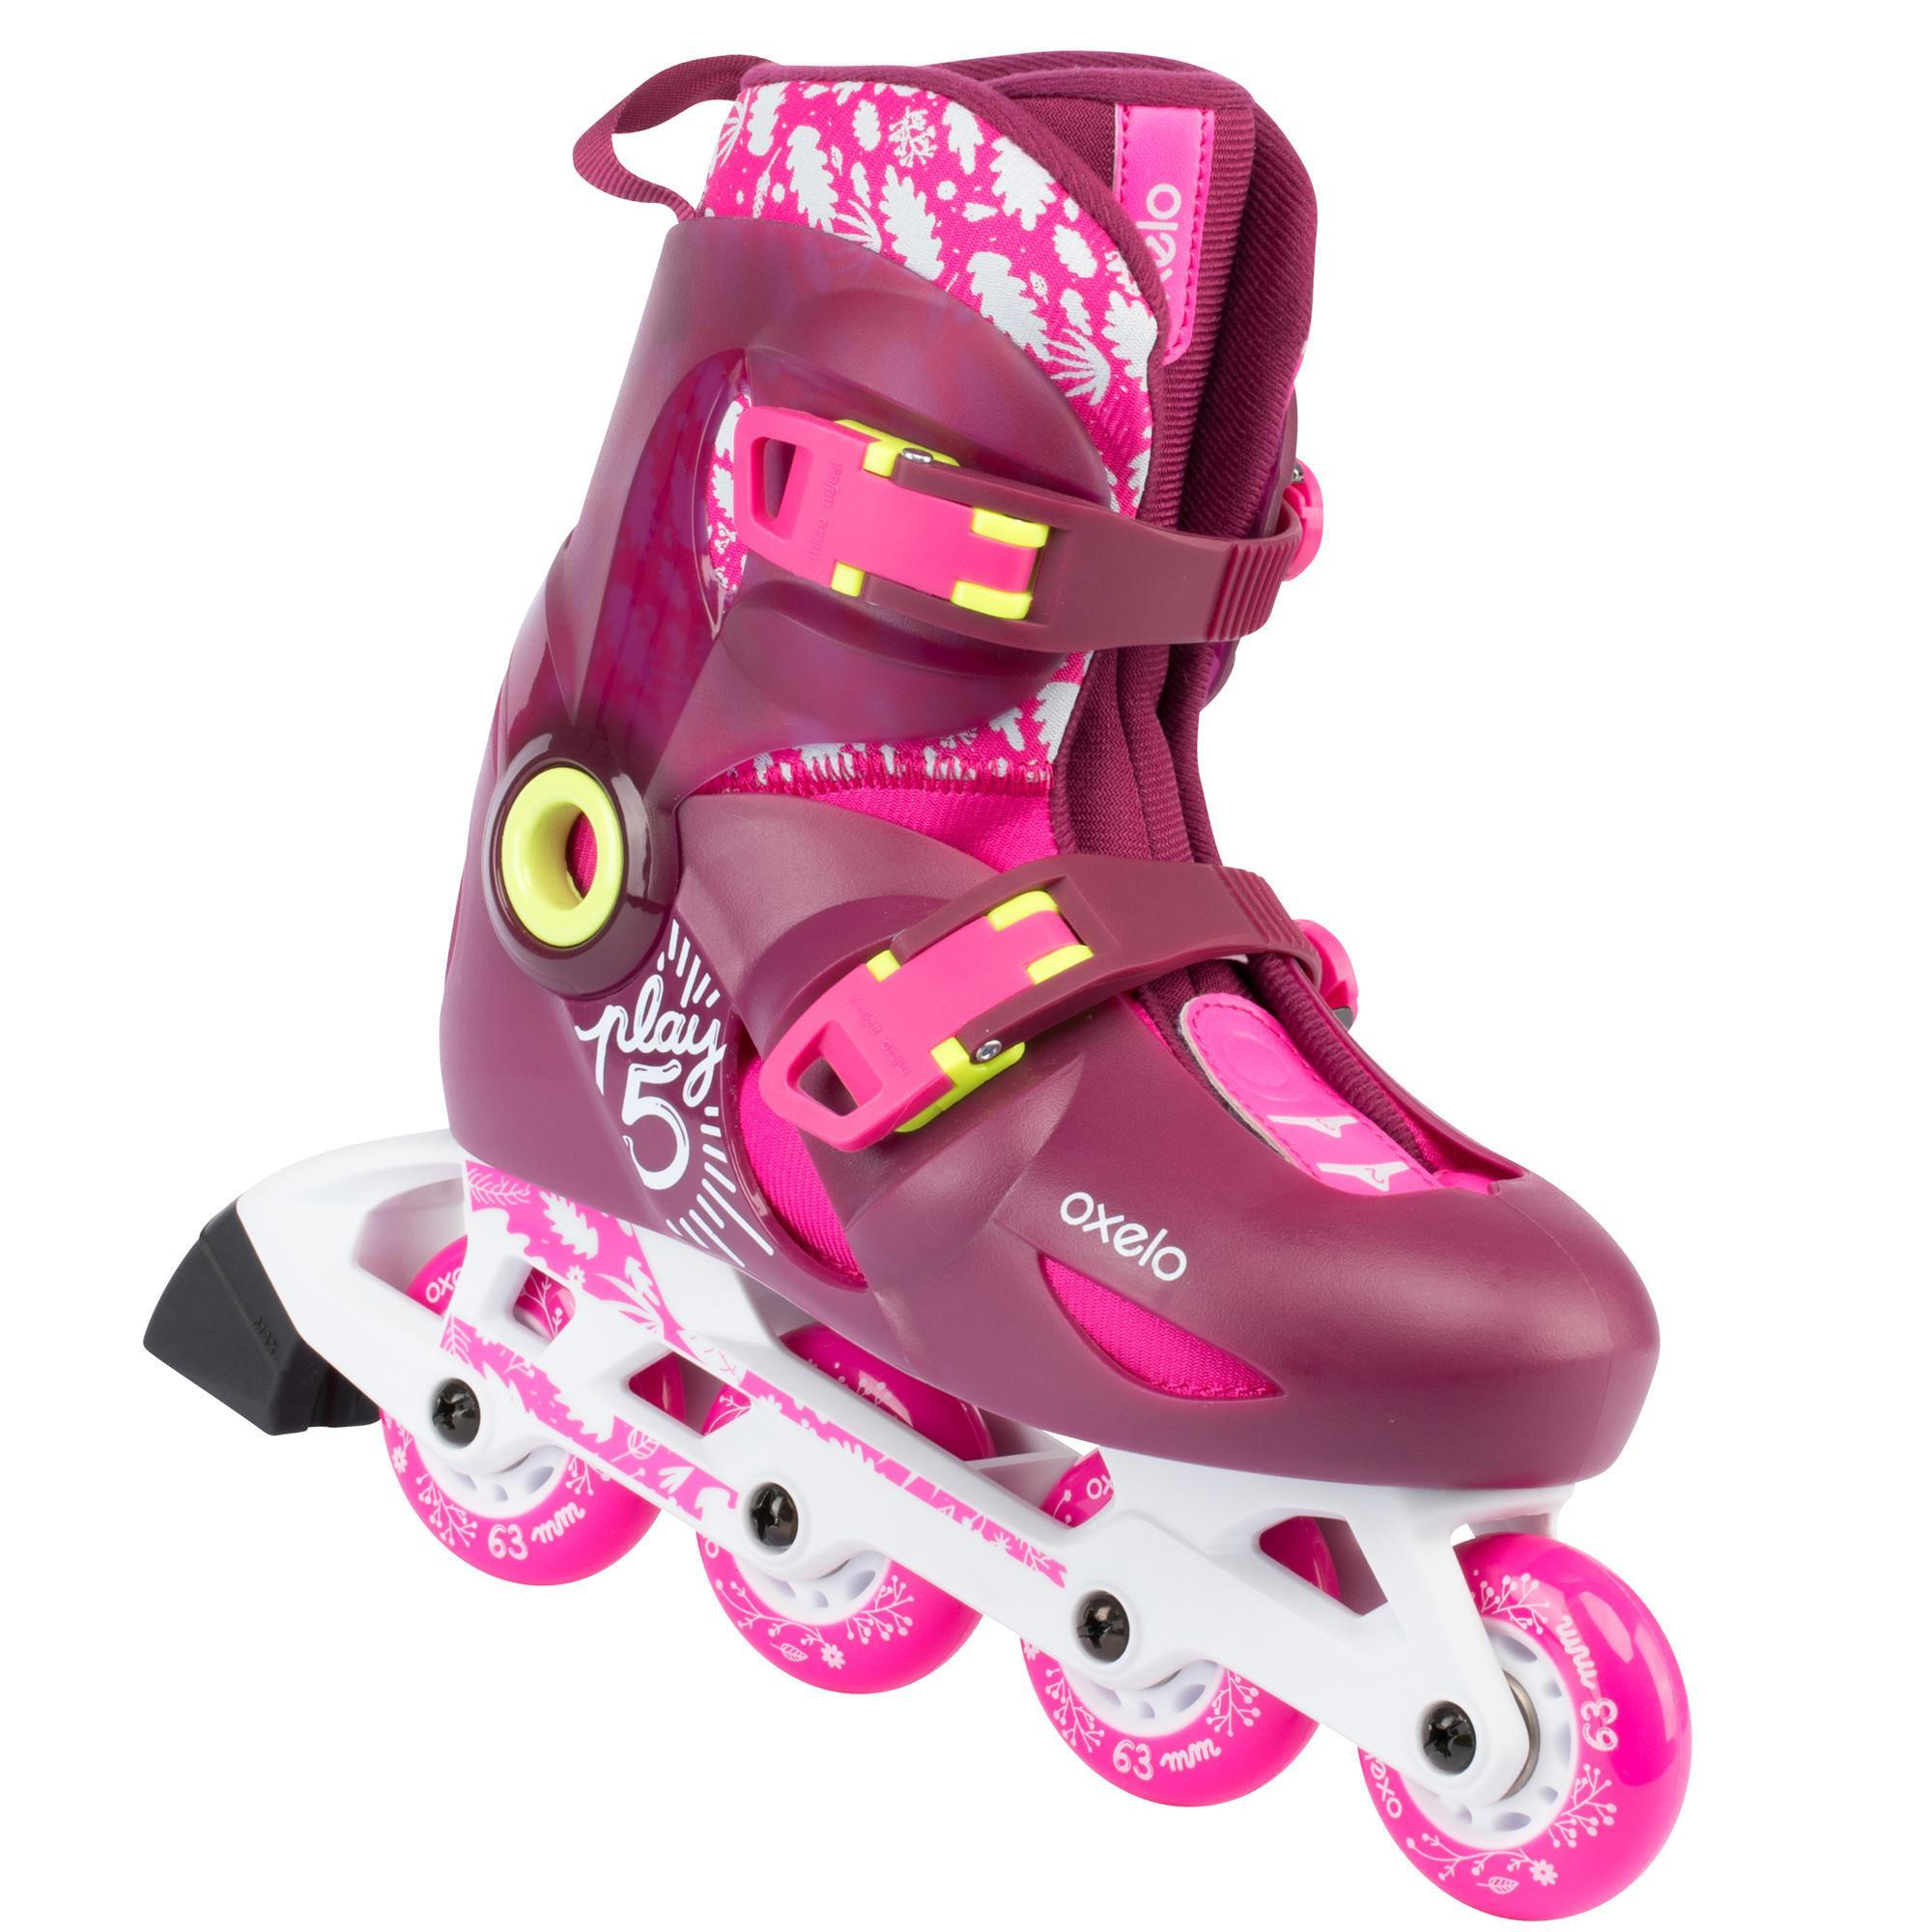 Inlineskating K2 BOA Junior Inline Skates Kinder Inlineskates Inliner Skate Größenverstellbar